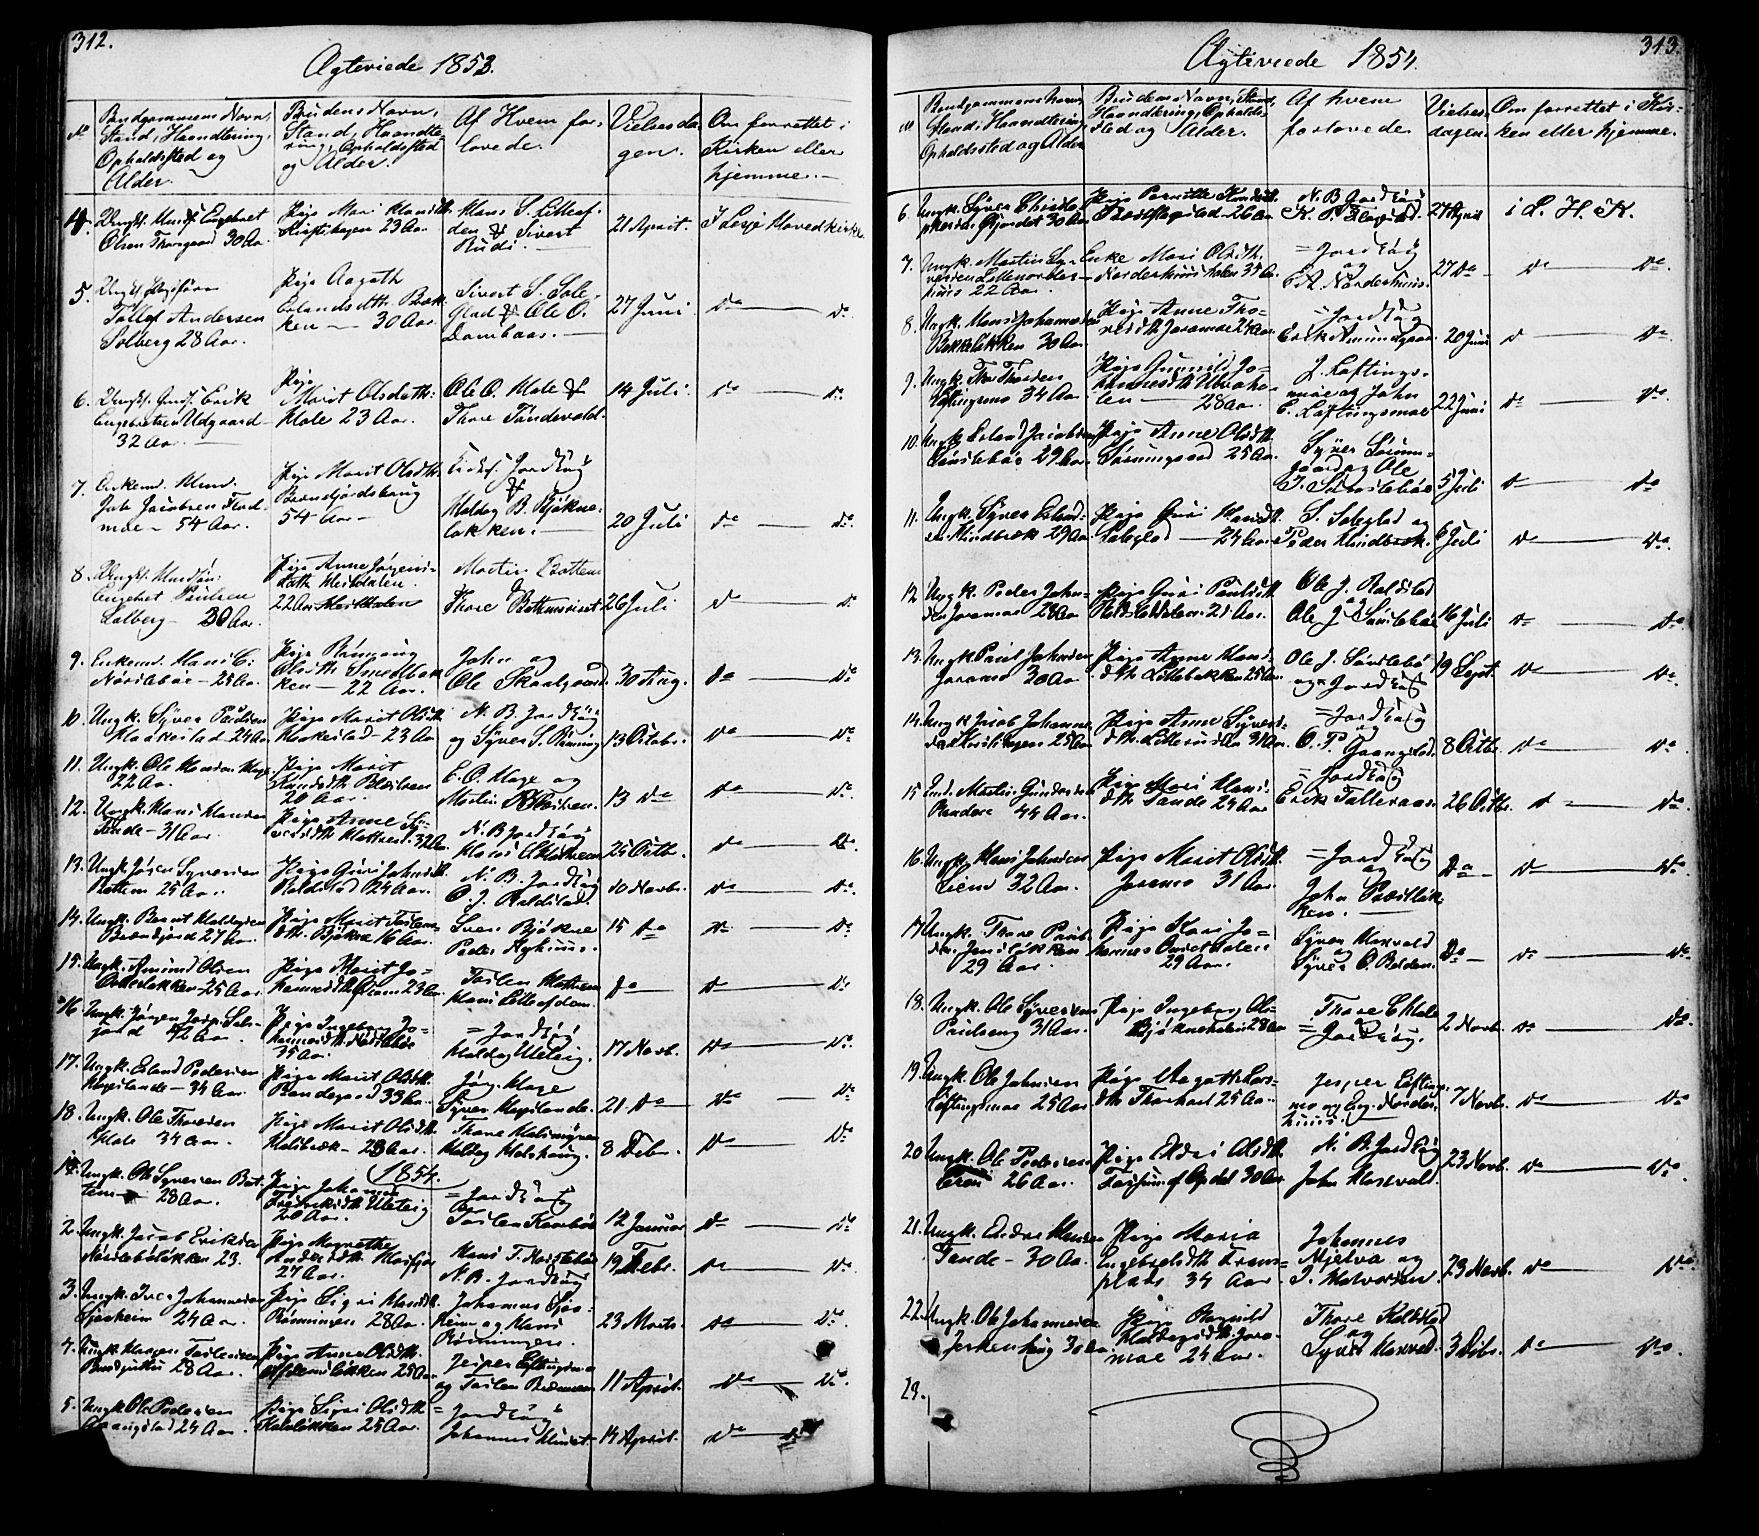 SAH, Lesja prestekontor, Klokkerbok nr. 5, 1850-1894, s. 312-313